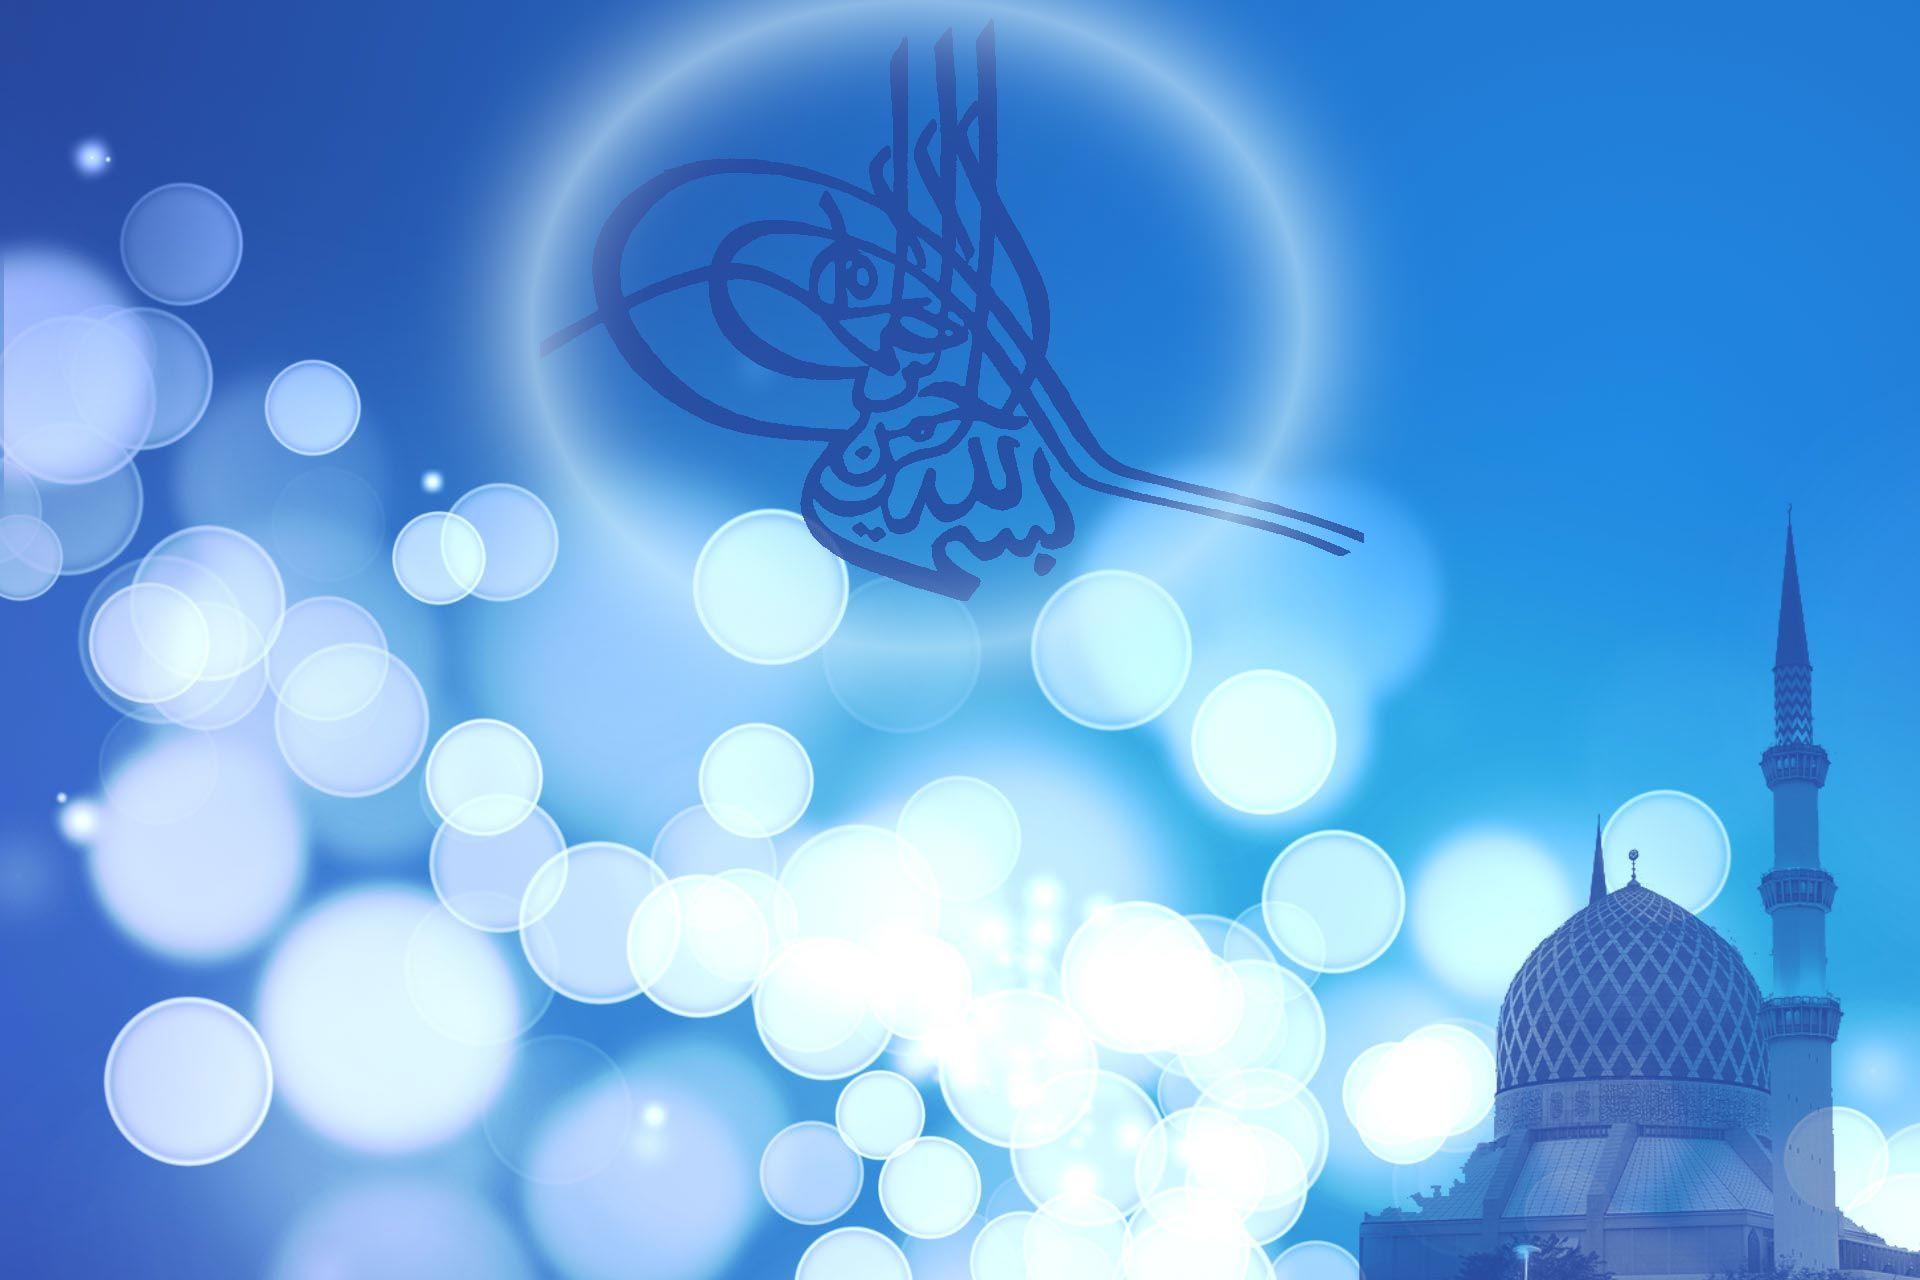 Samsung Galaxy Note 3 Islamic Wallpaper 1